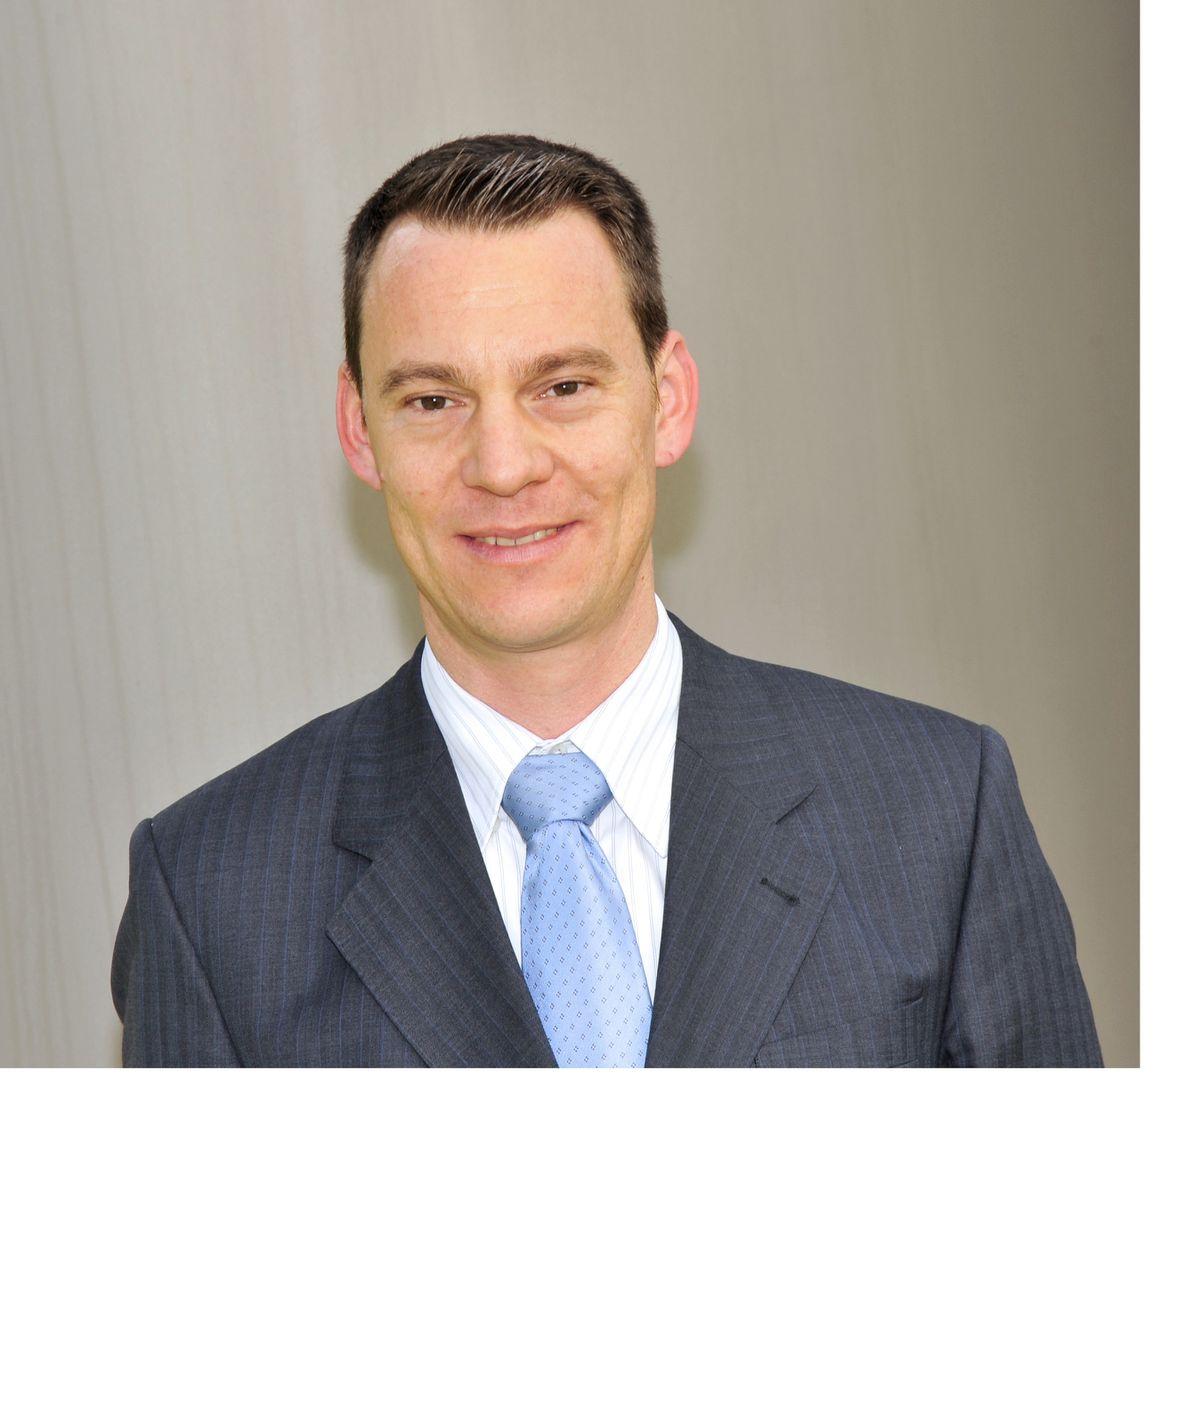 Prof Heiner Evanschitzky of Aston University